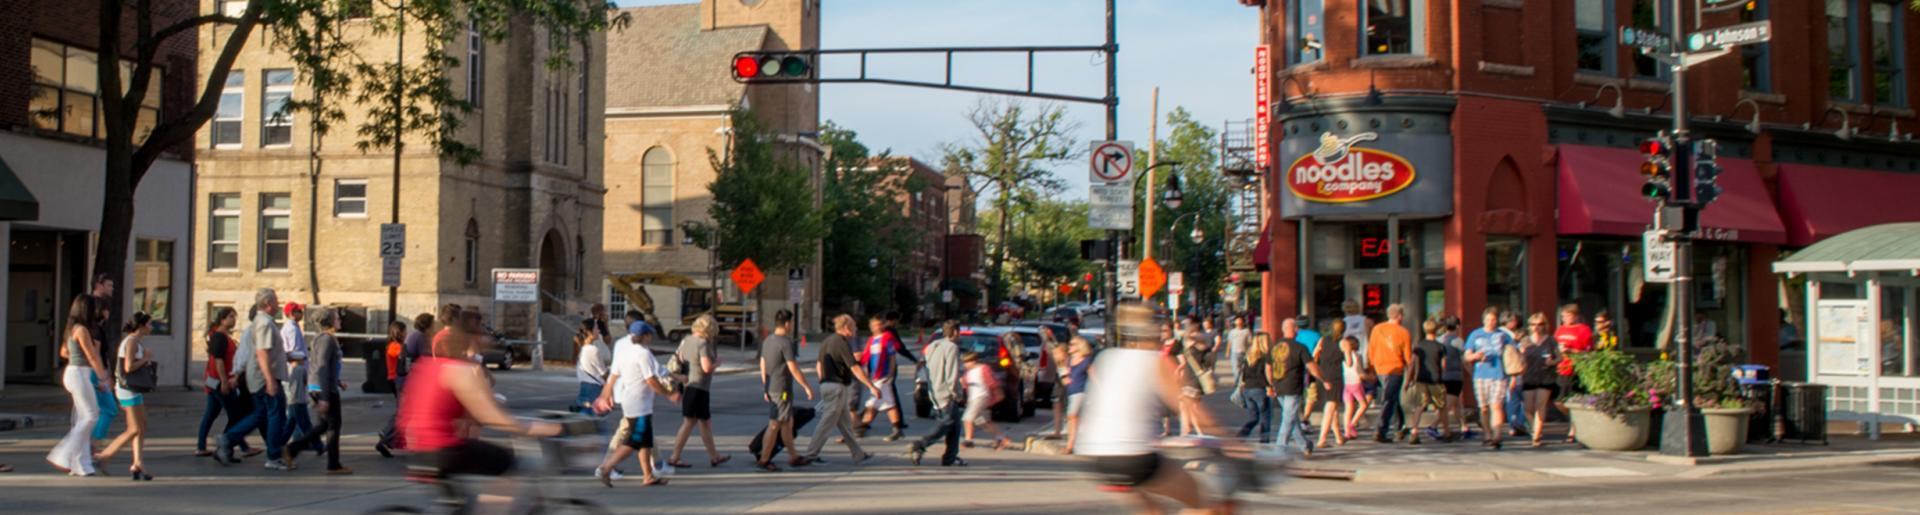 State Street in Summer